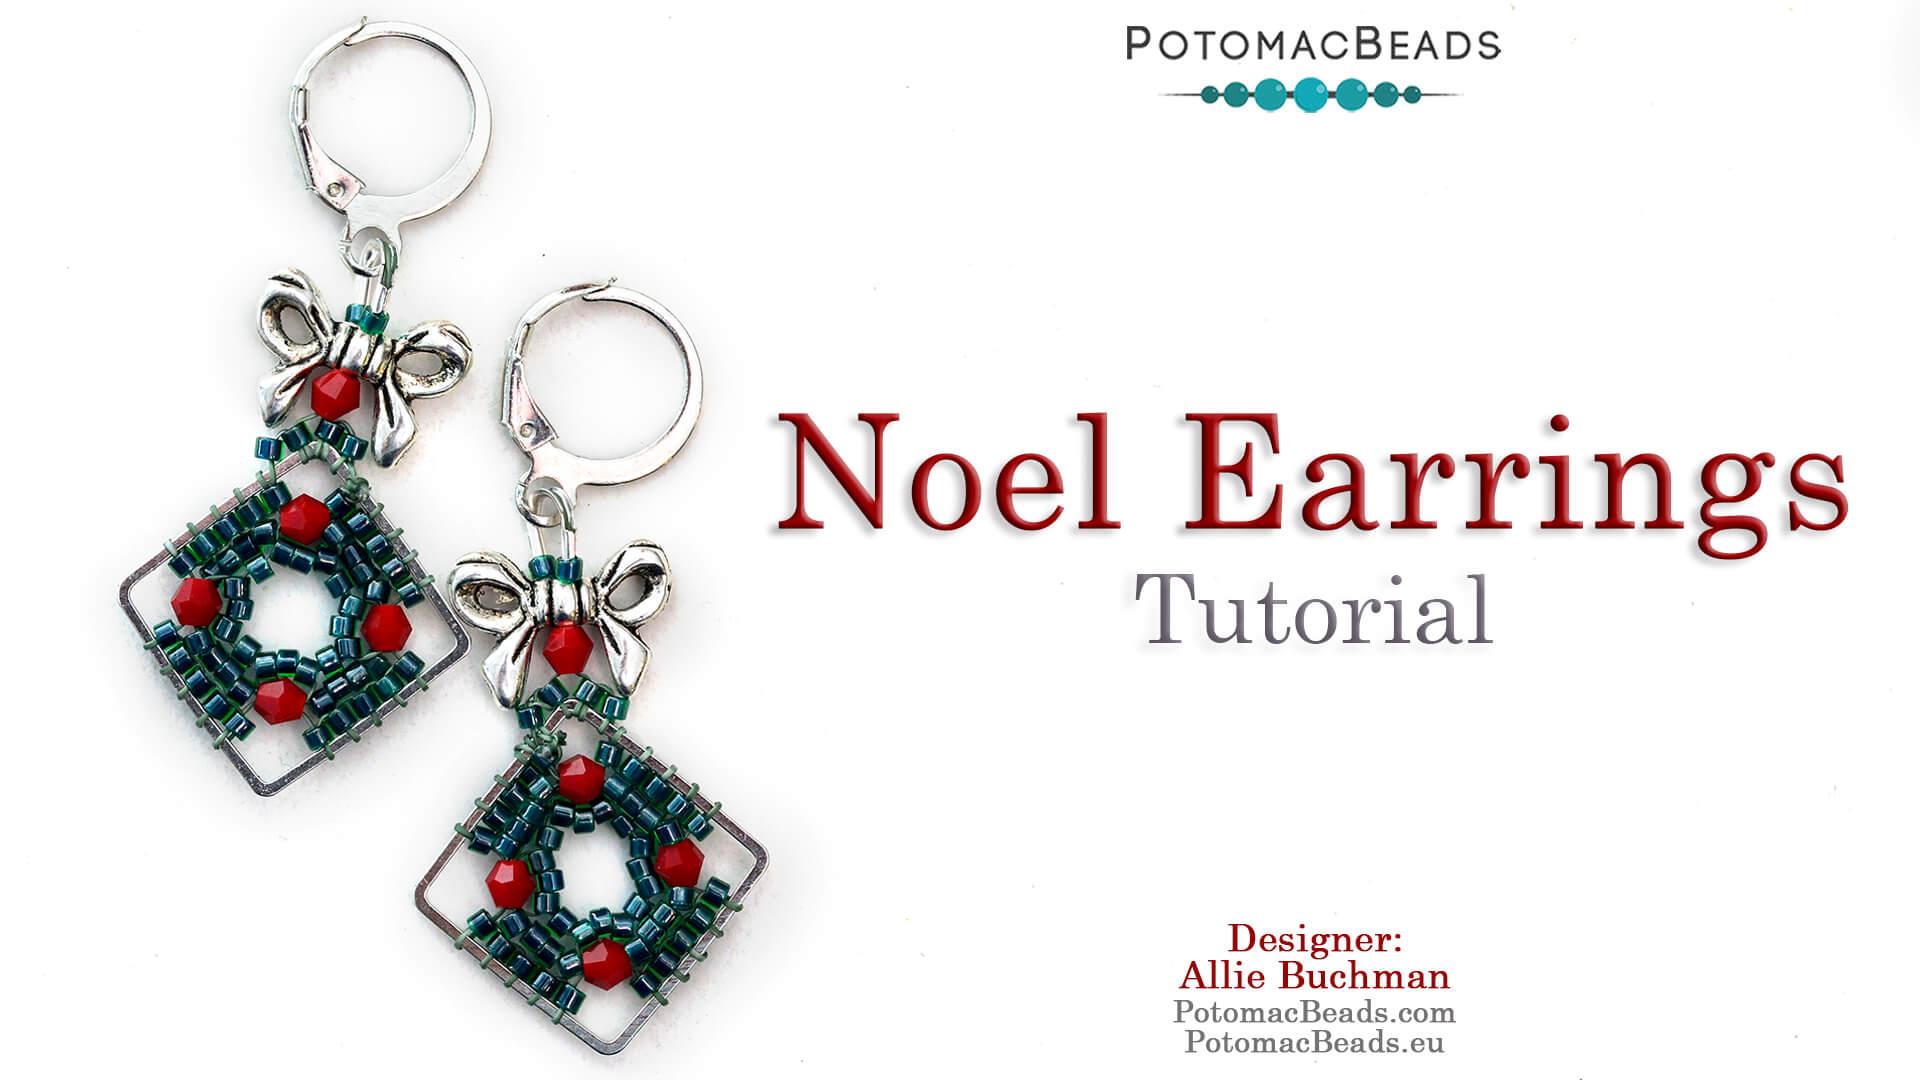 How to Bead Jewelry / Beading Tutorials & Jewel Making Videos / Earring Projects / Noel Earrings Tutorial